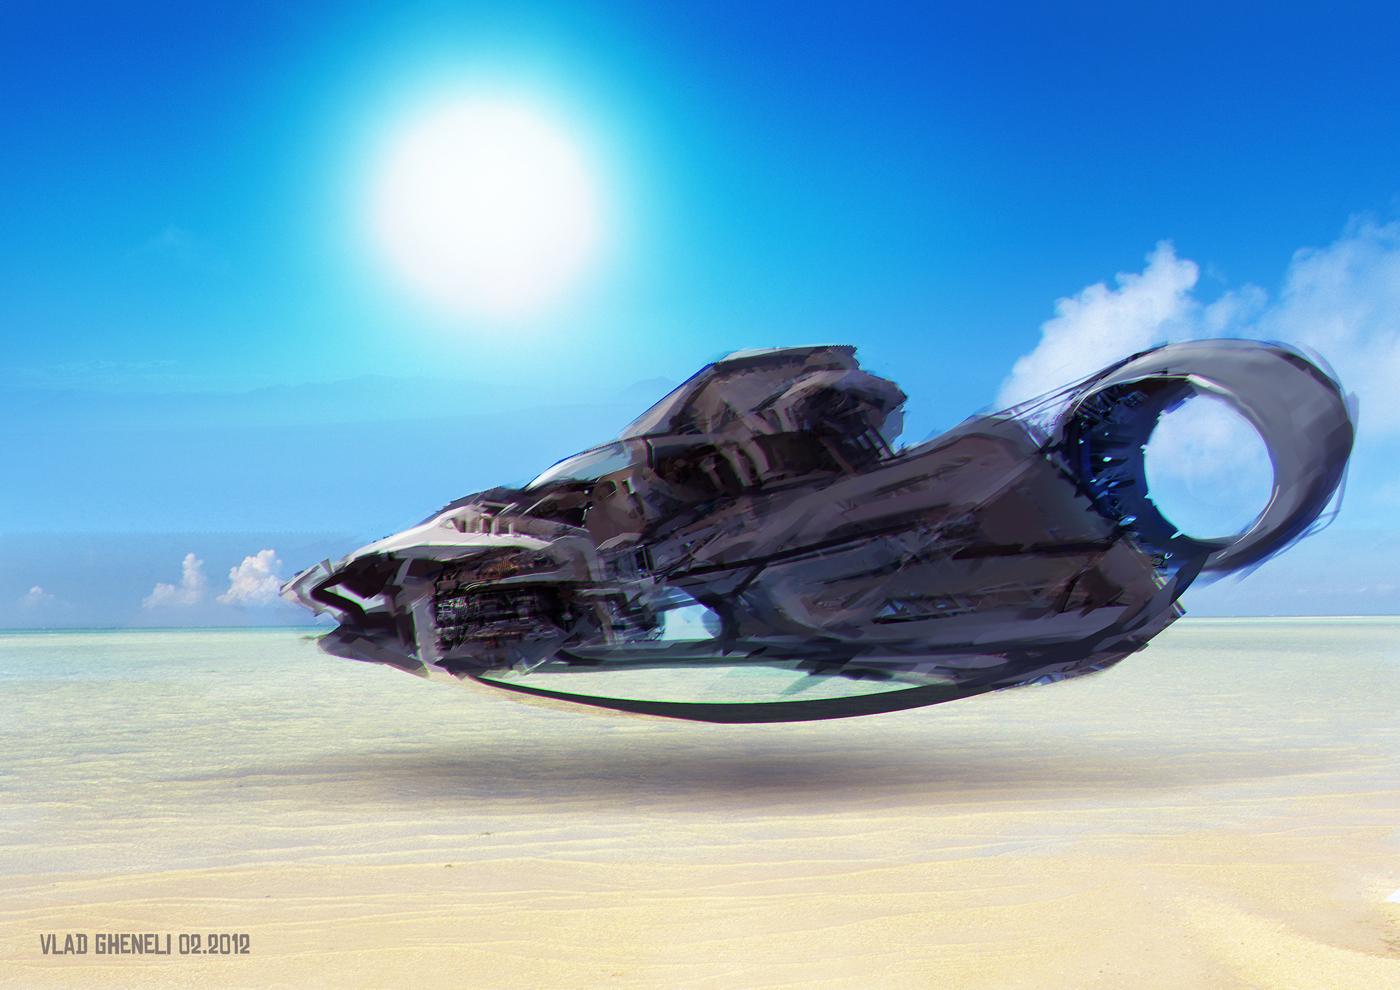 Futuristic Hovercraft by vladgheneli